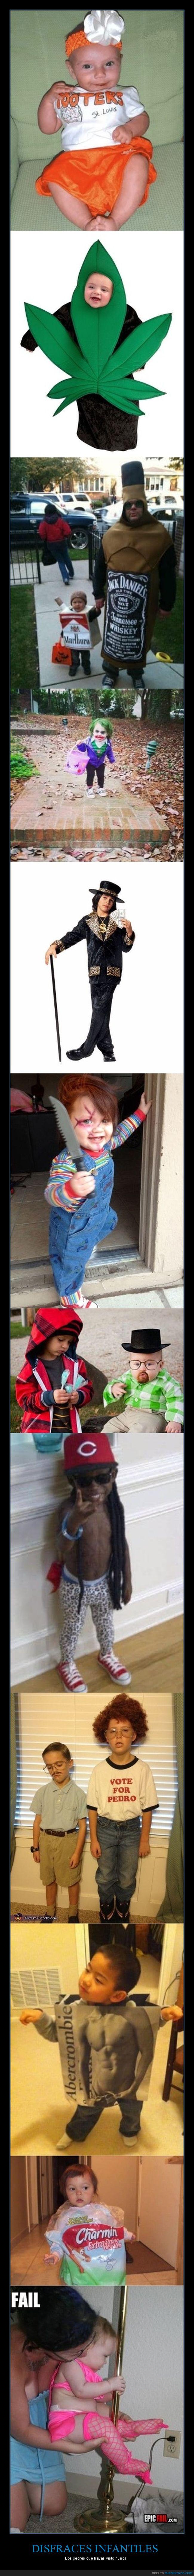 disfraces infantiles,fails,niños,wtf